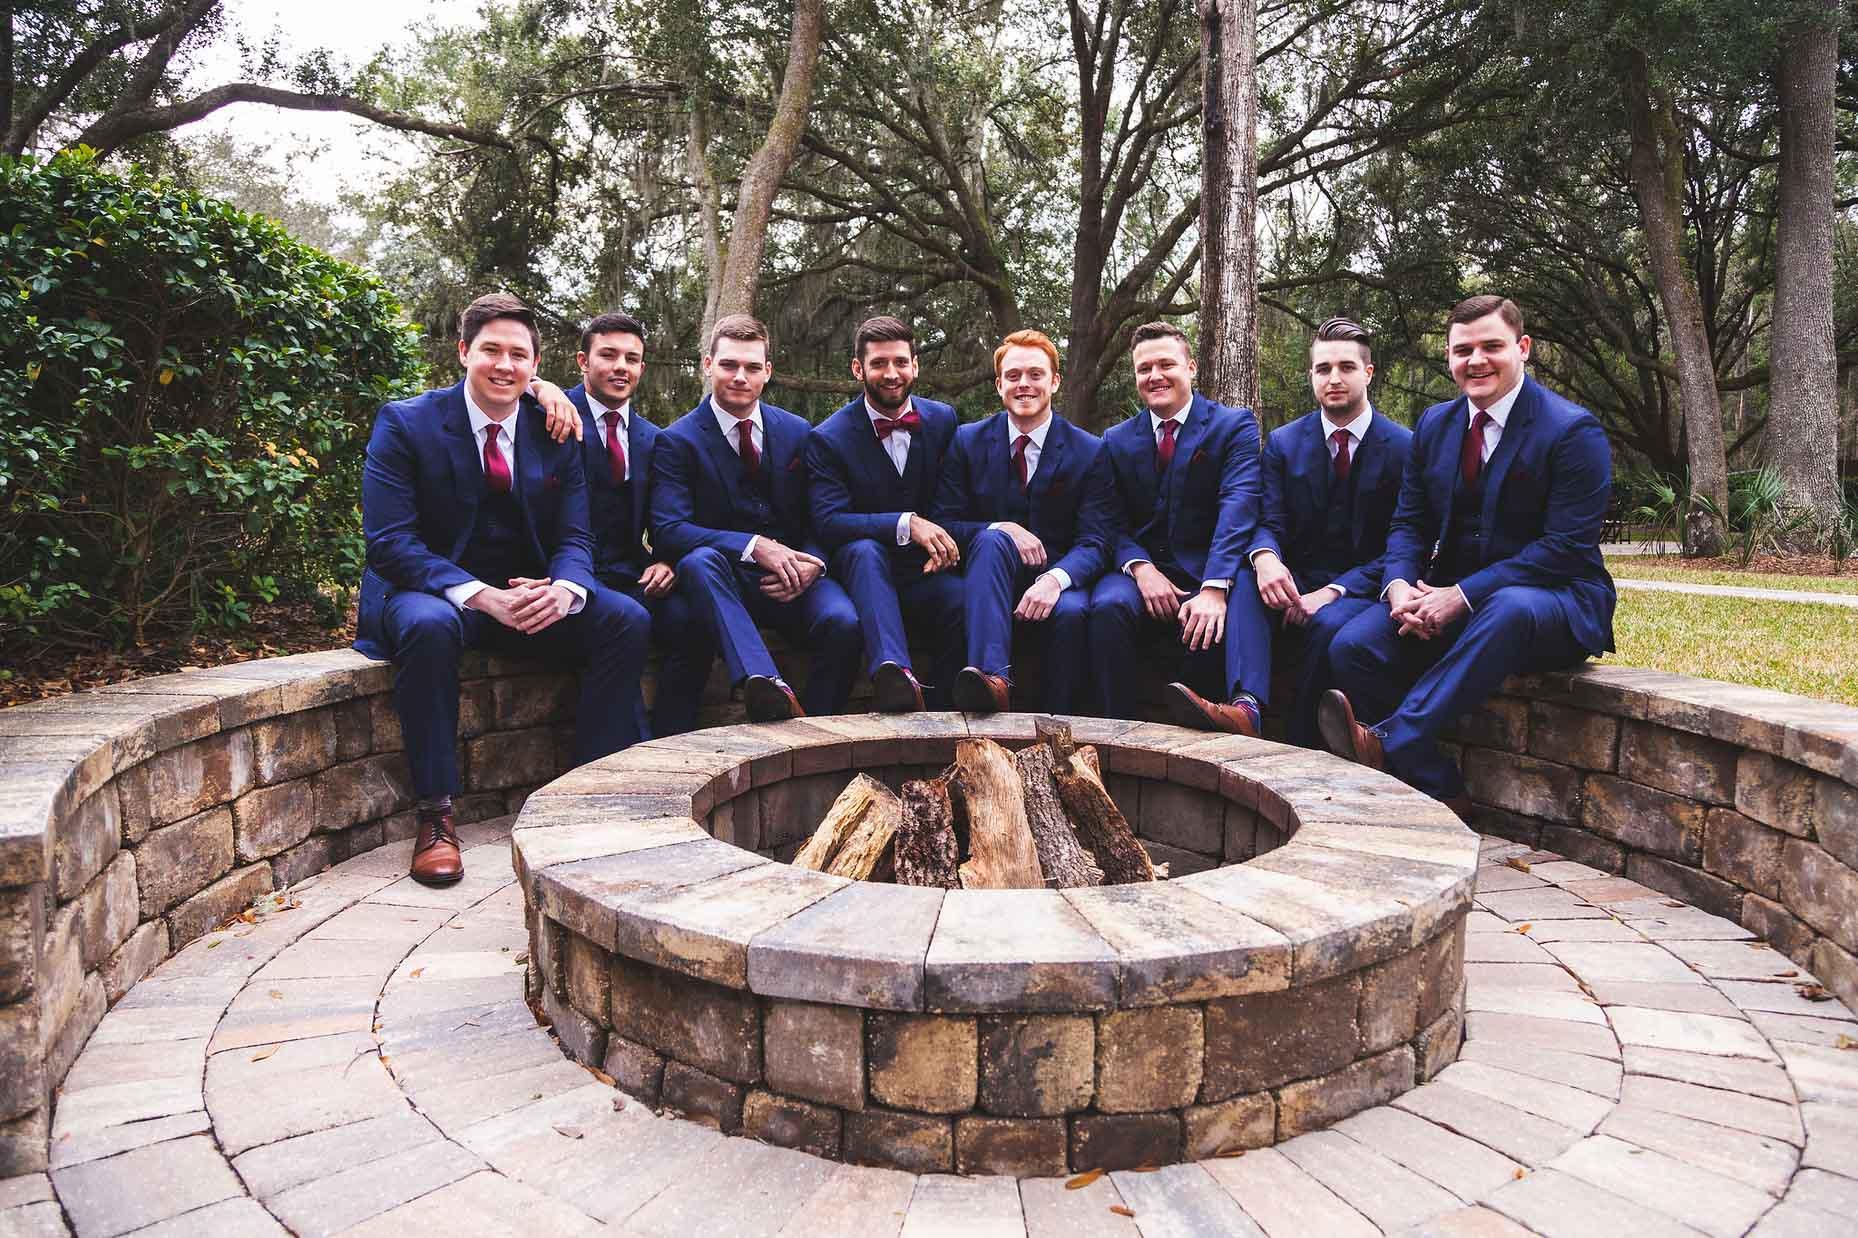 adam-szarmack-bowing-oaks-wedding-photographer-jacksonville-54.jpg